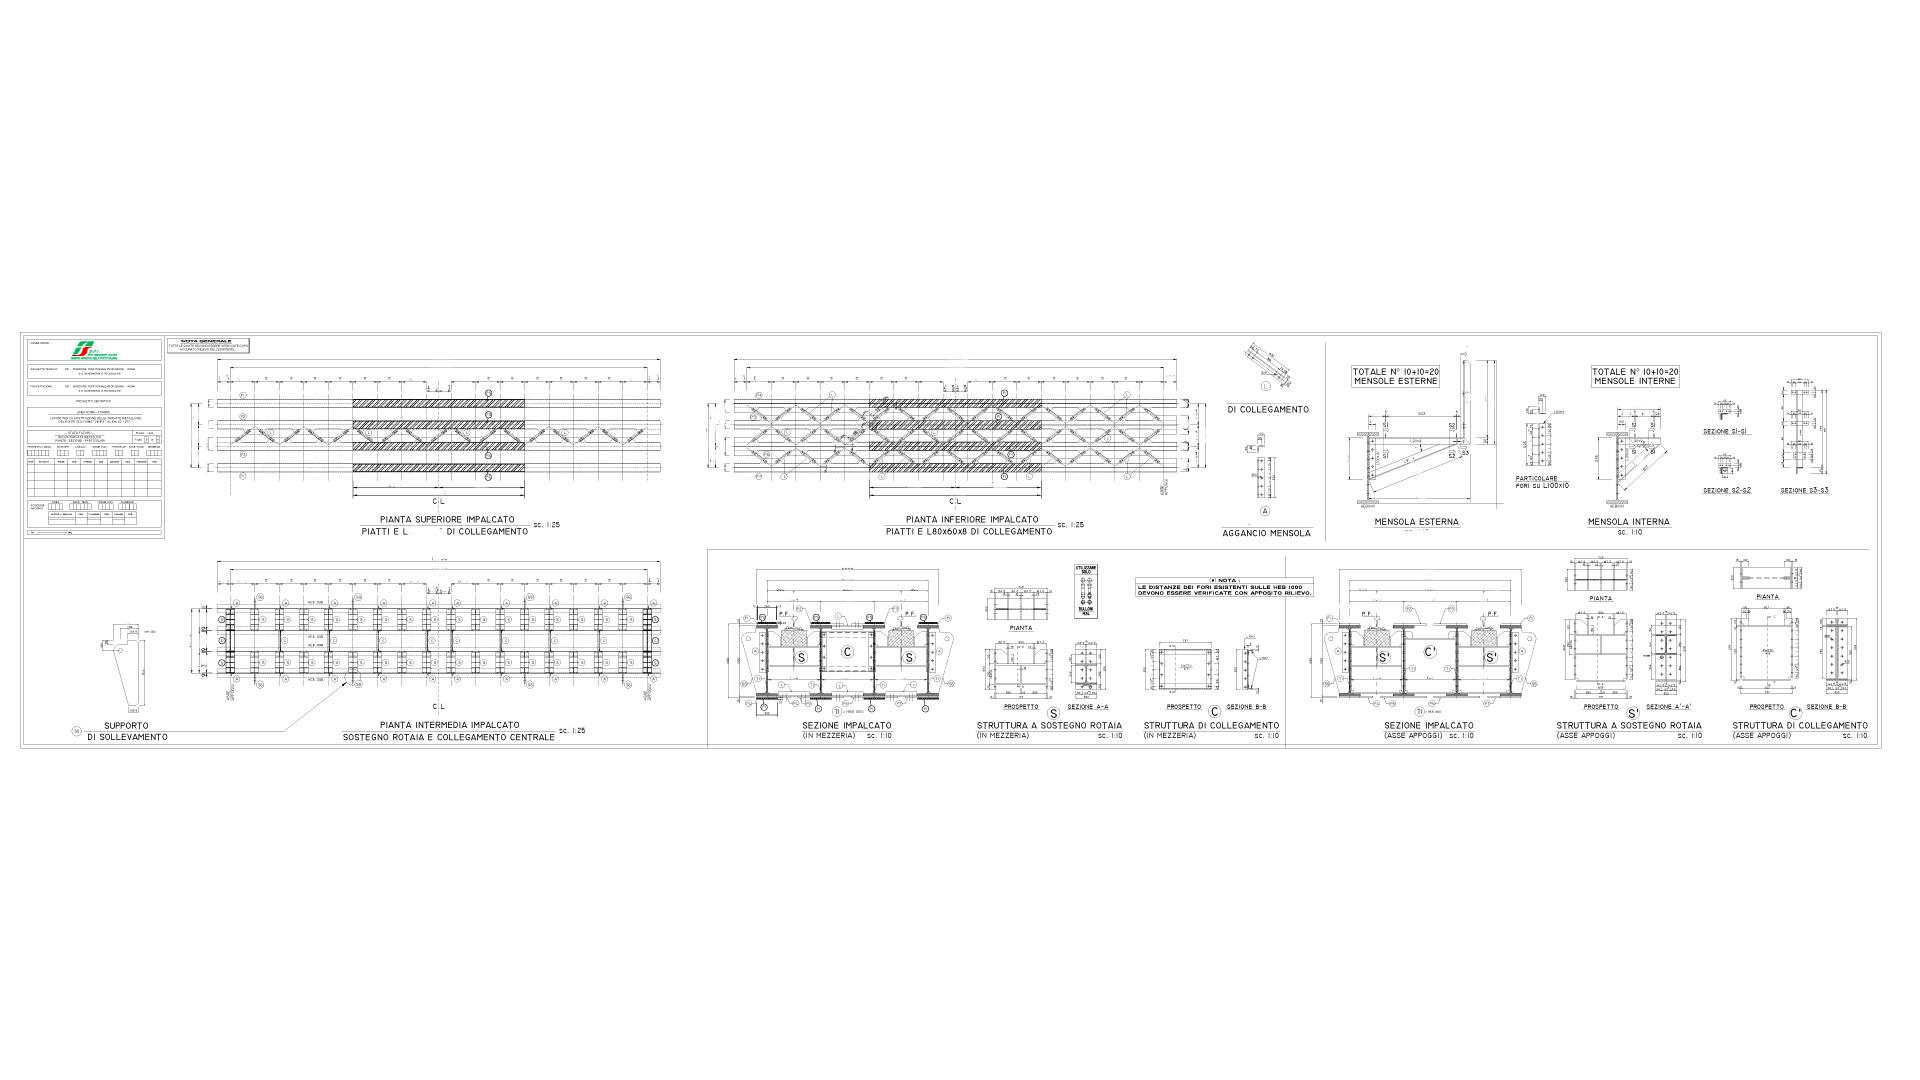 ponte-ferroviario-ninfa-progetto-metal-engineering-carpenteria-metallica-civile